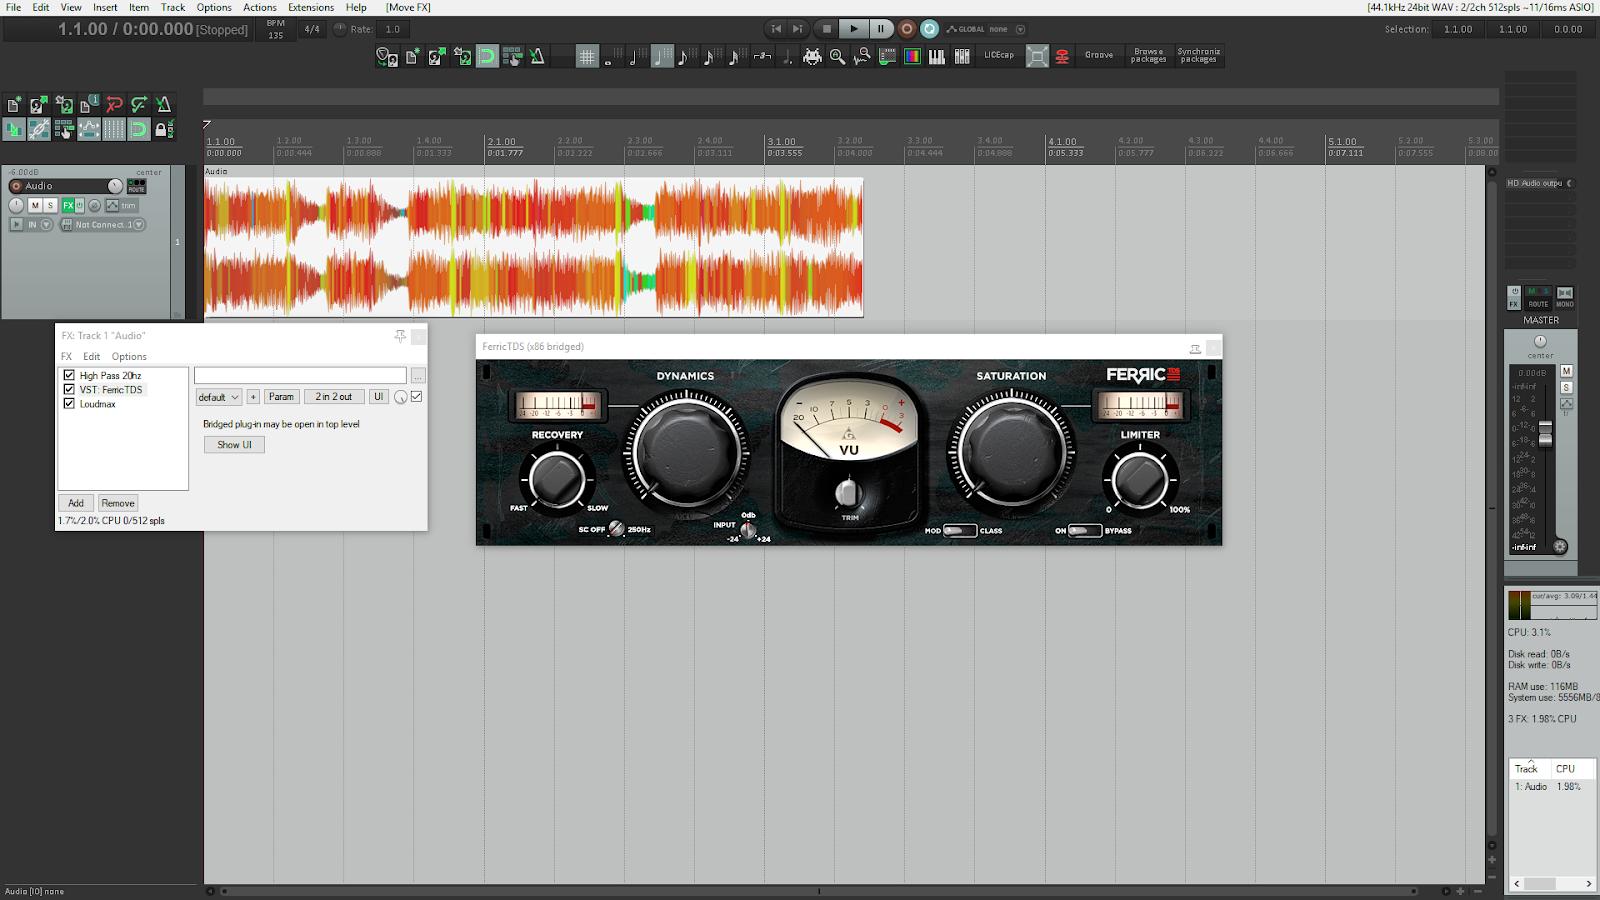 Send FX or Track FX - Audio Ordeal